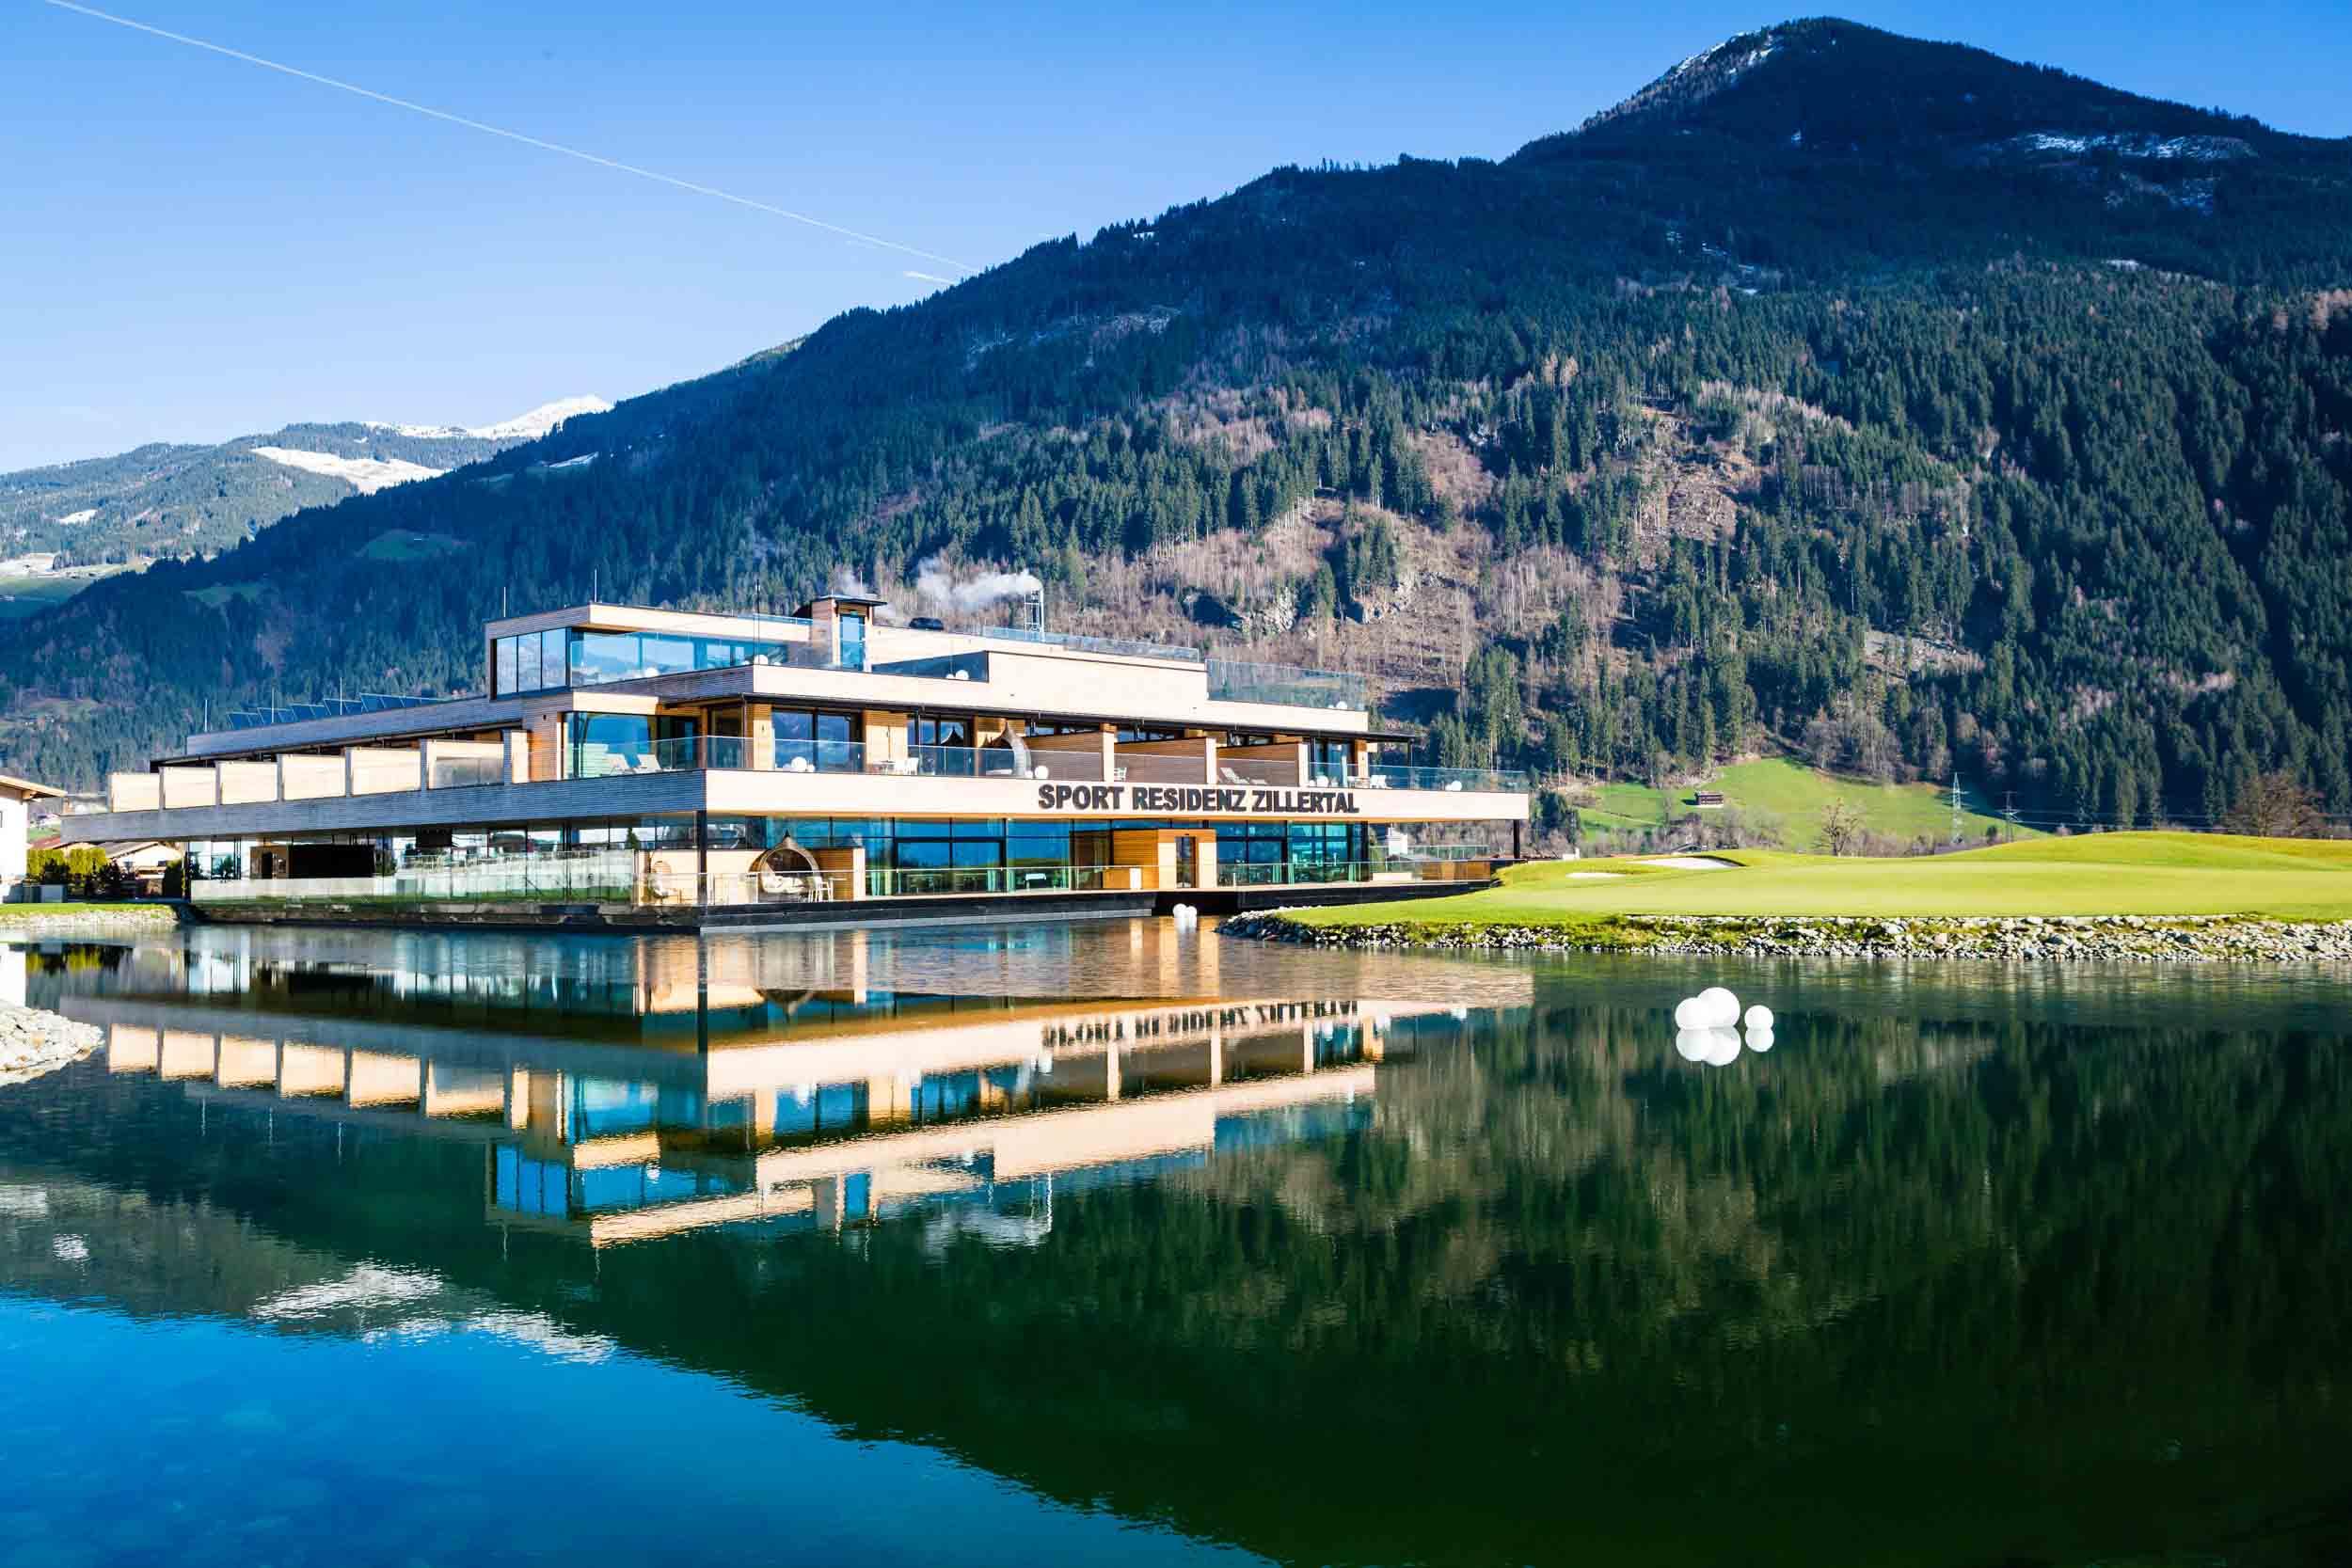 Golfclub zillertal uderns alpenmag for Designhotel zillertal